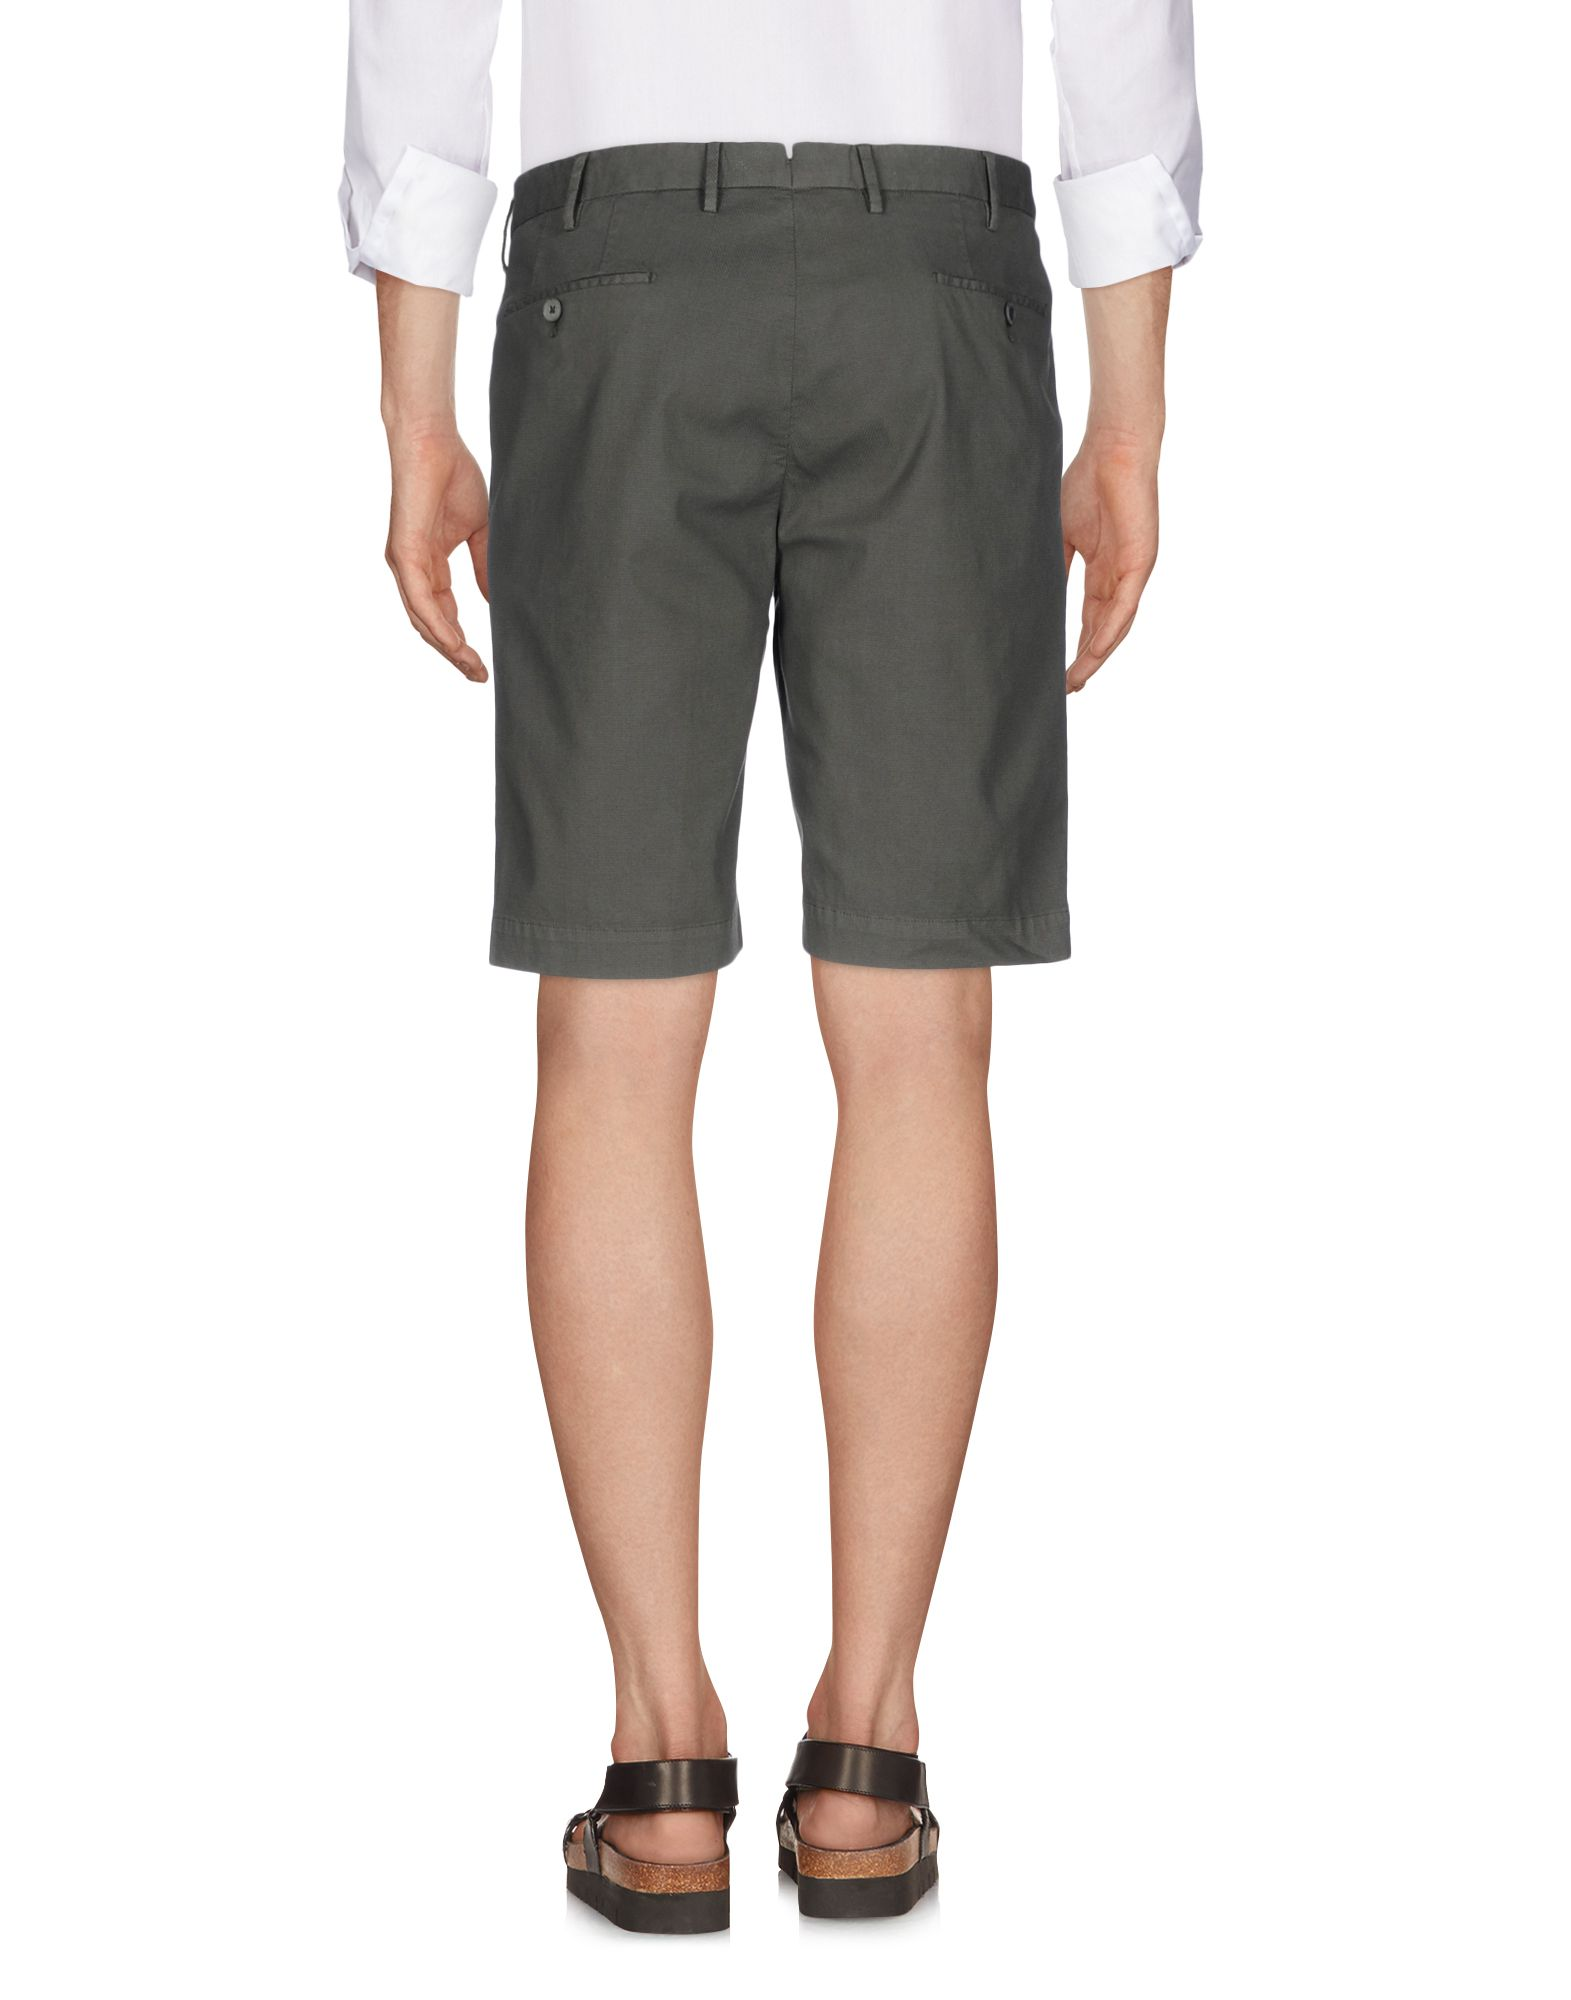 Shorts & Pantalone Bermuda Gta Il Pantalone & Uomo - 13096679CB 840c69